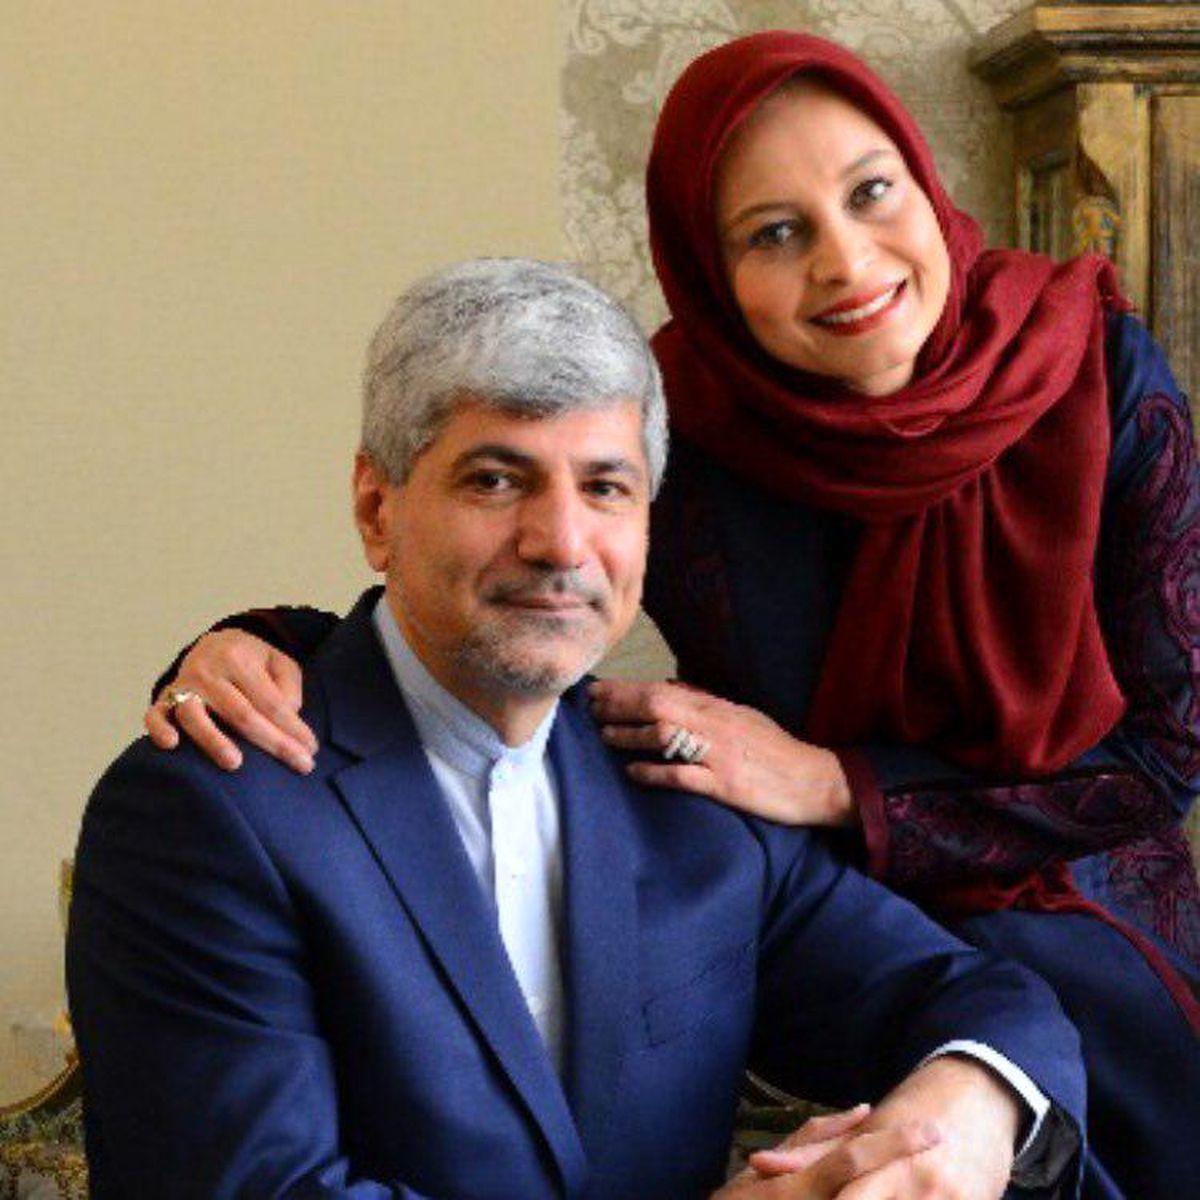 طلاق مریم کاویانی از شوهر سیاستمدارش+تصاویر